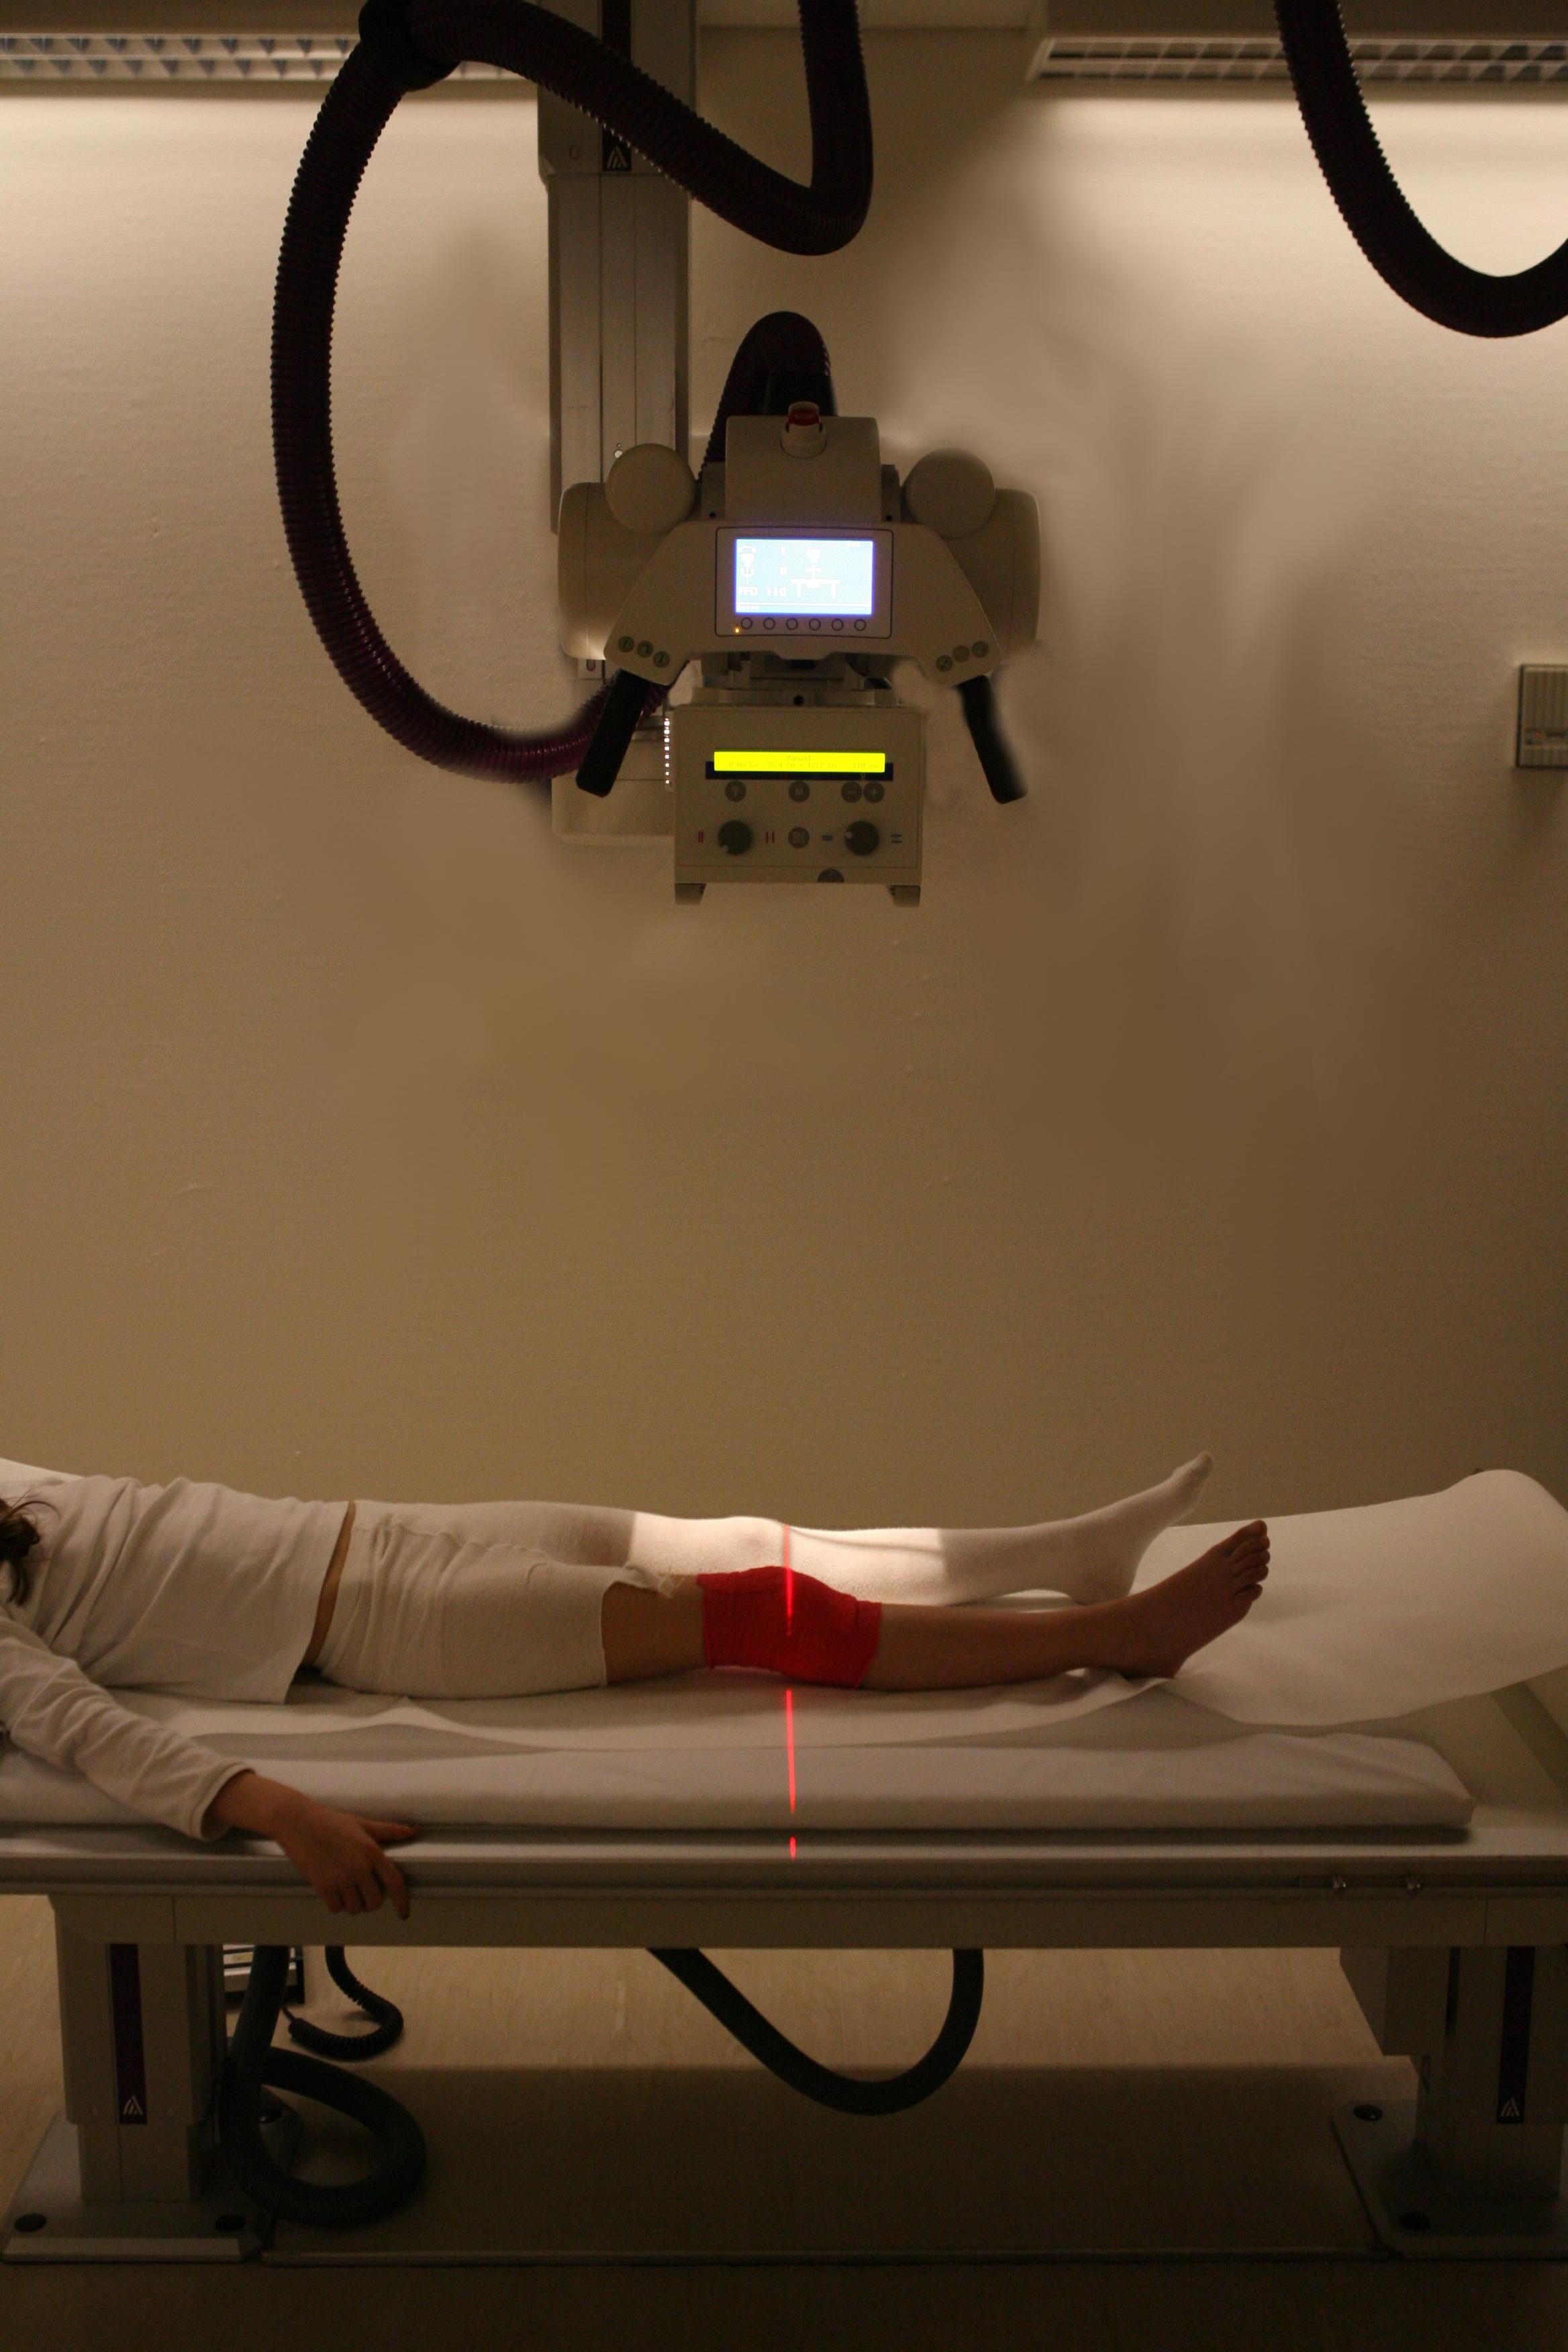 Radiography - Wikipedia